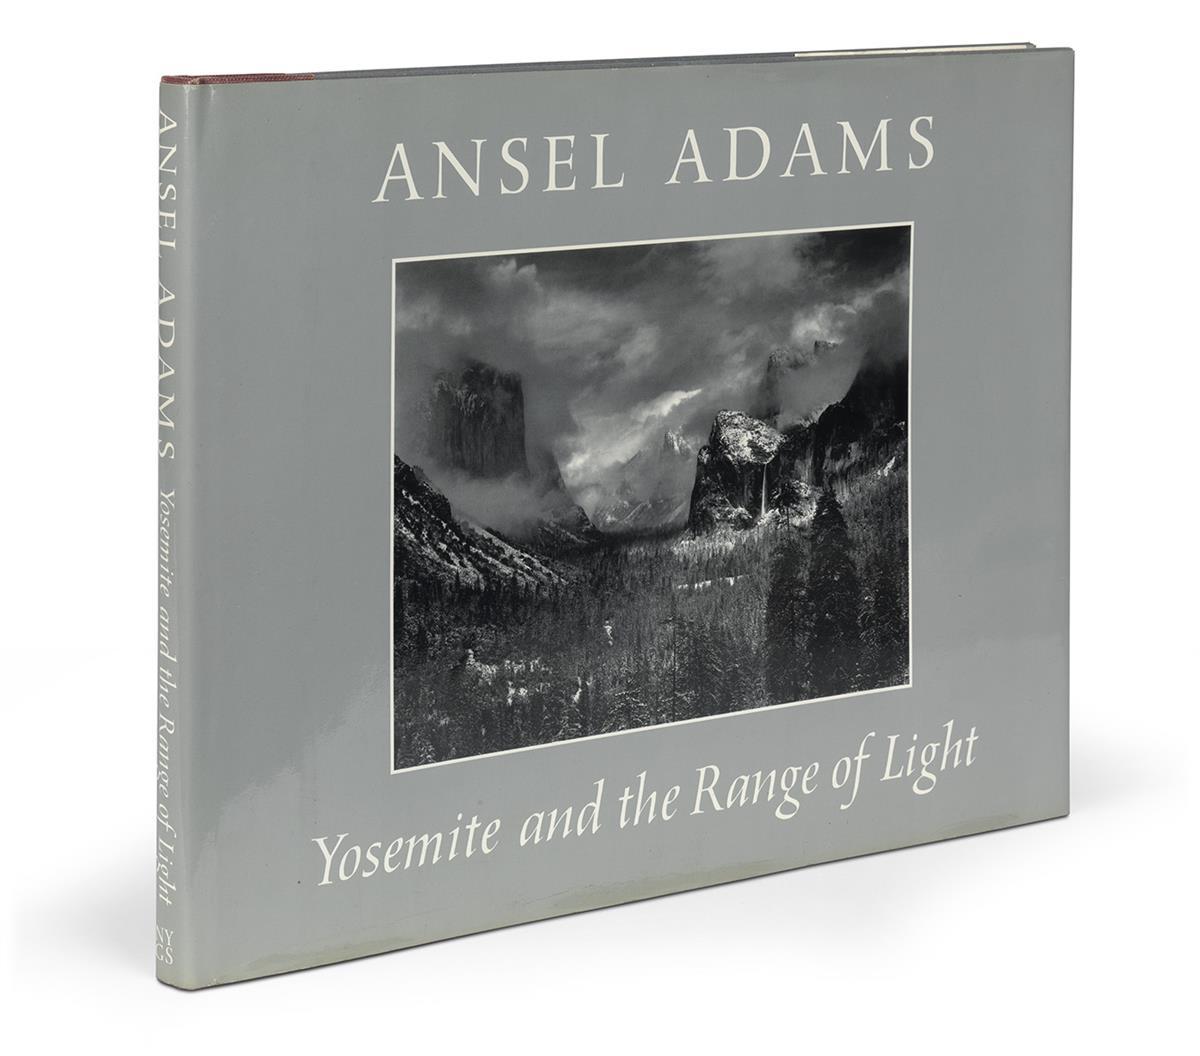 ANSEL-ADAMS-Yosemite-and-the-Range-of-Light